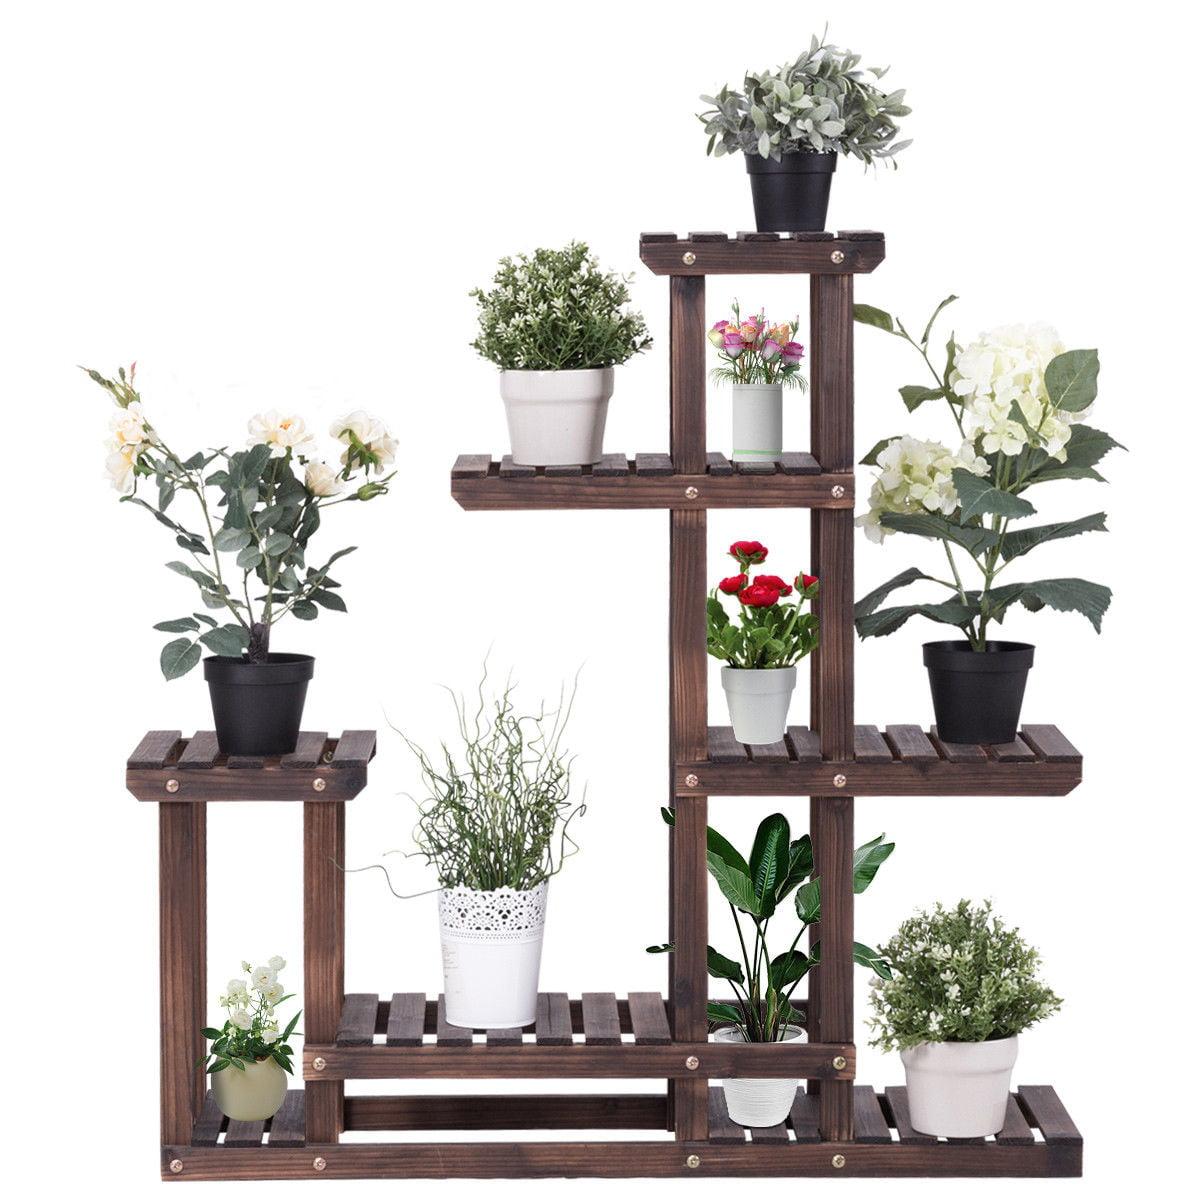 Costway Outdoor Wooden Flower Plant Stand 6 Shelves Walmart Com Walmart Com